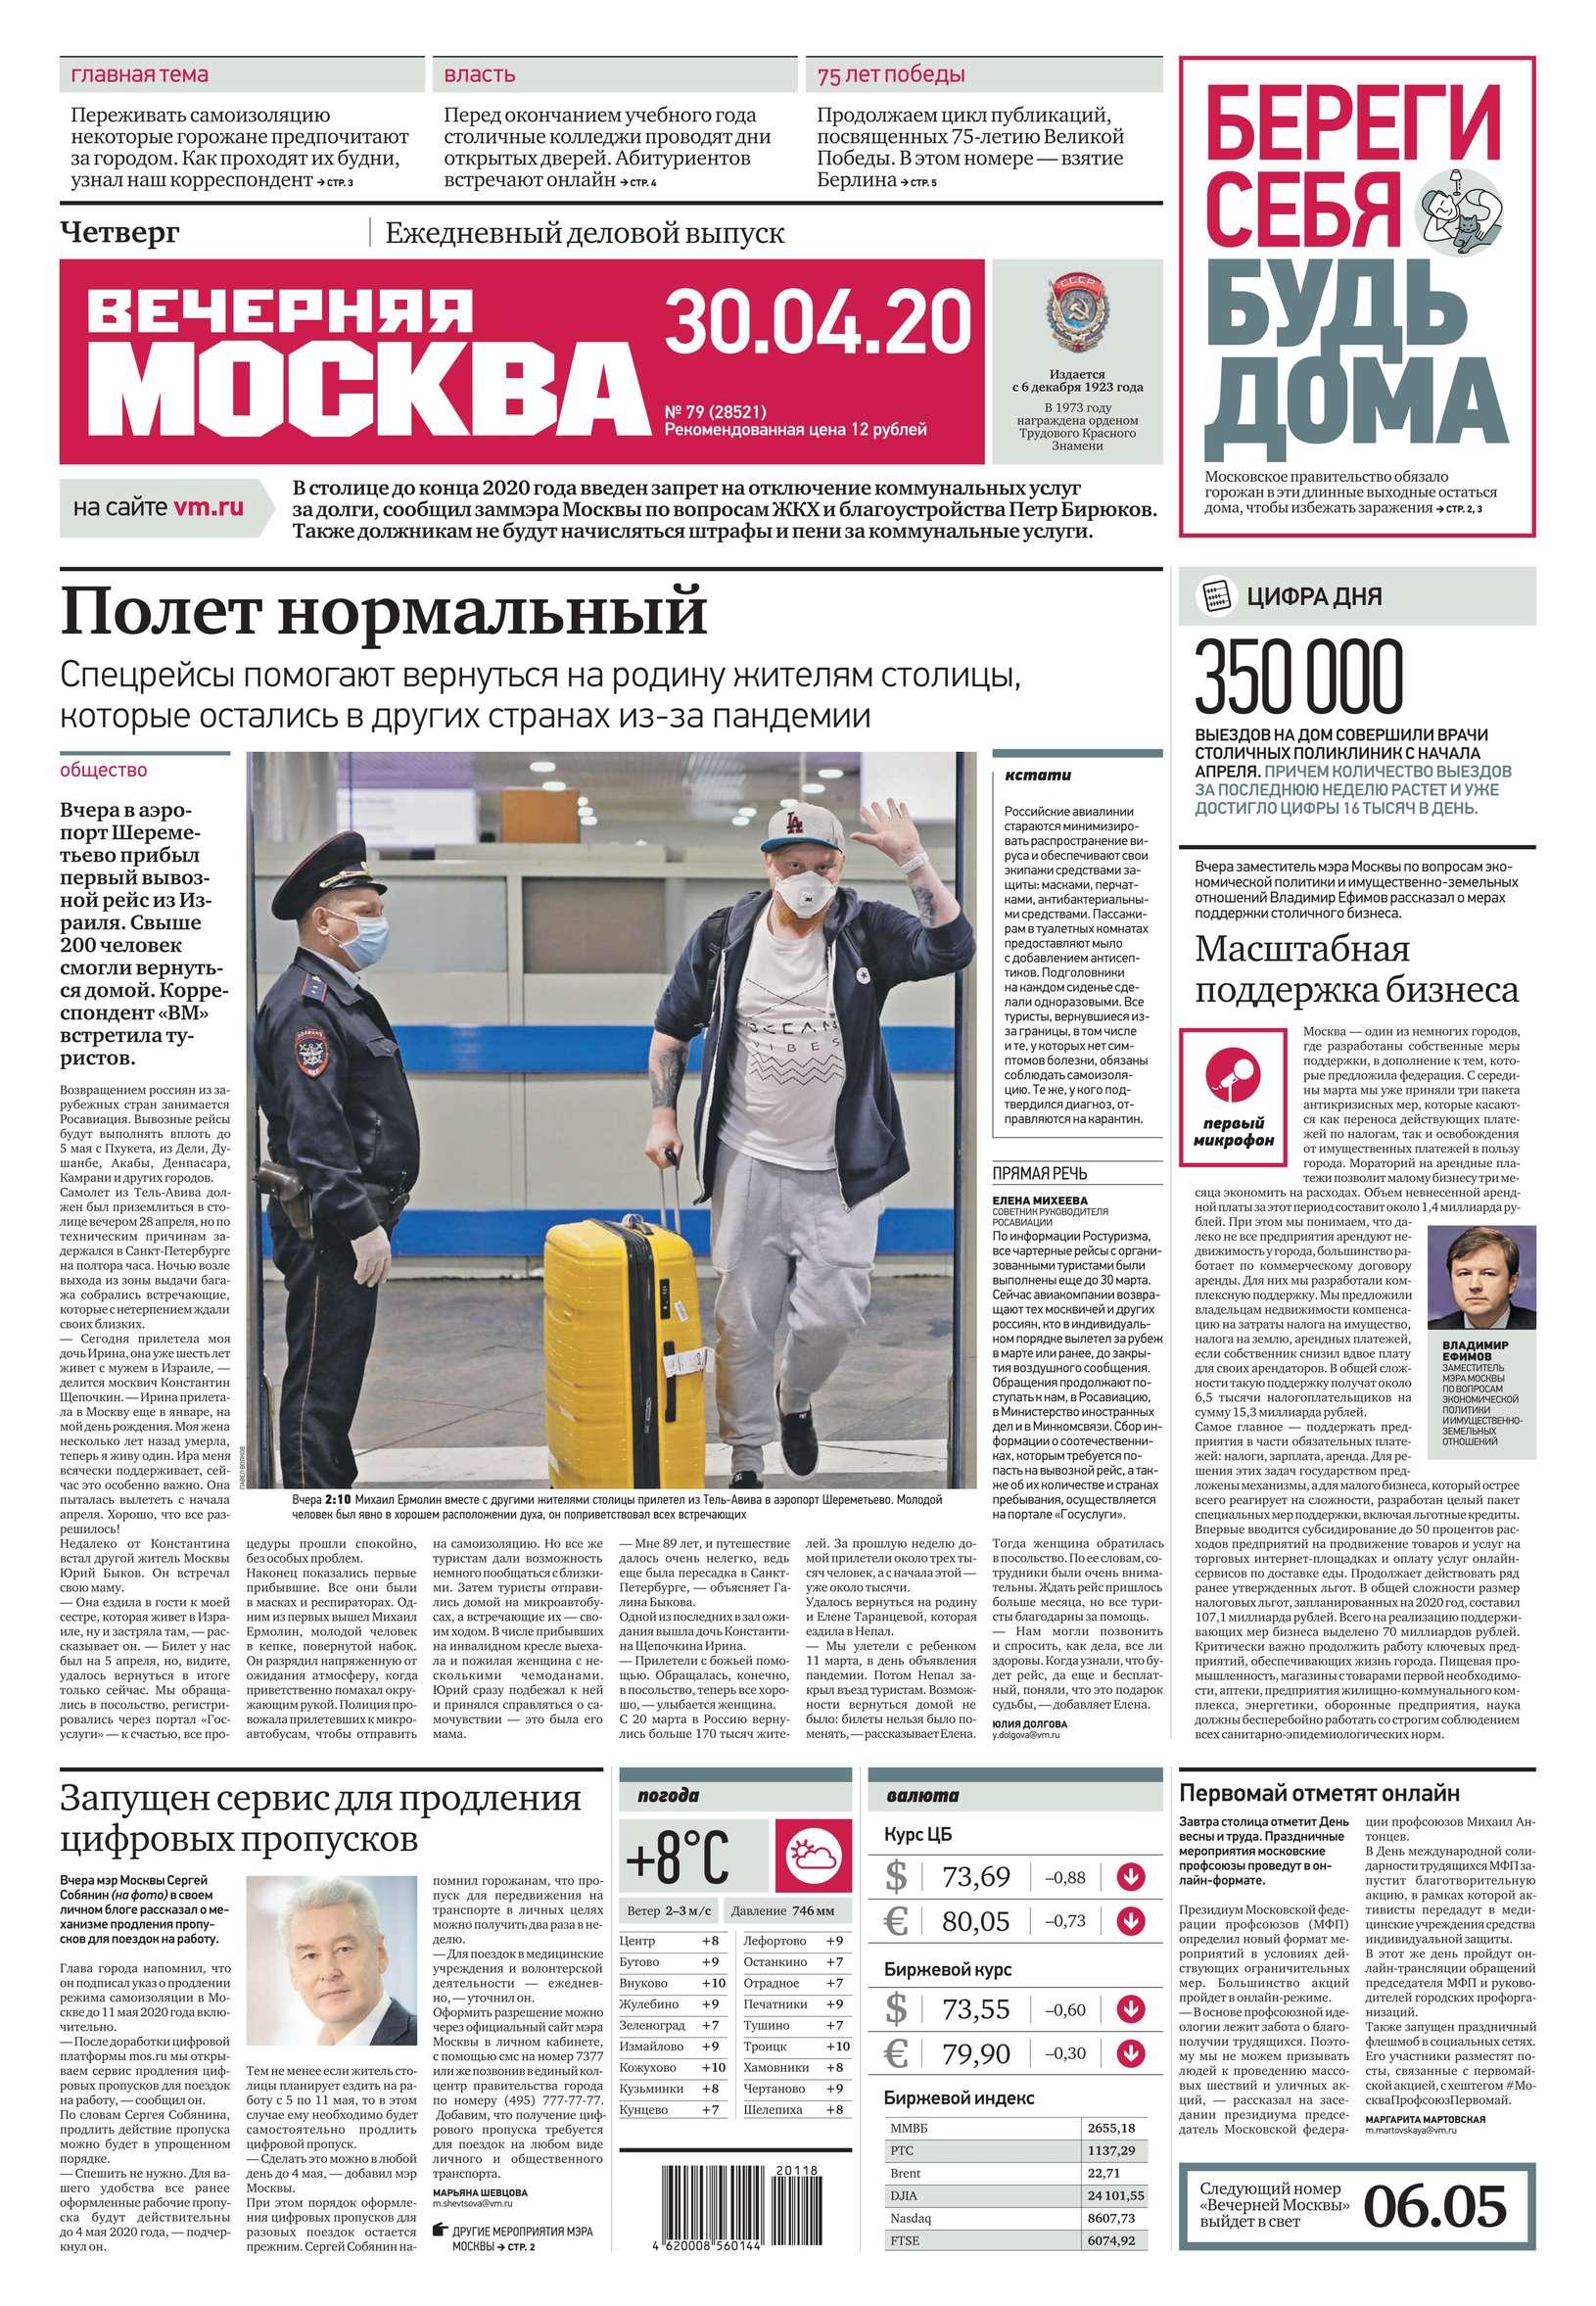 Редакция газеты Вечерняя Москва Вечерняя Москва 79-2020